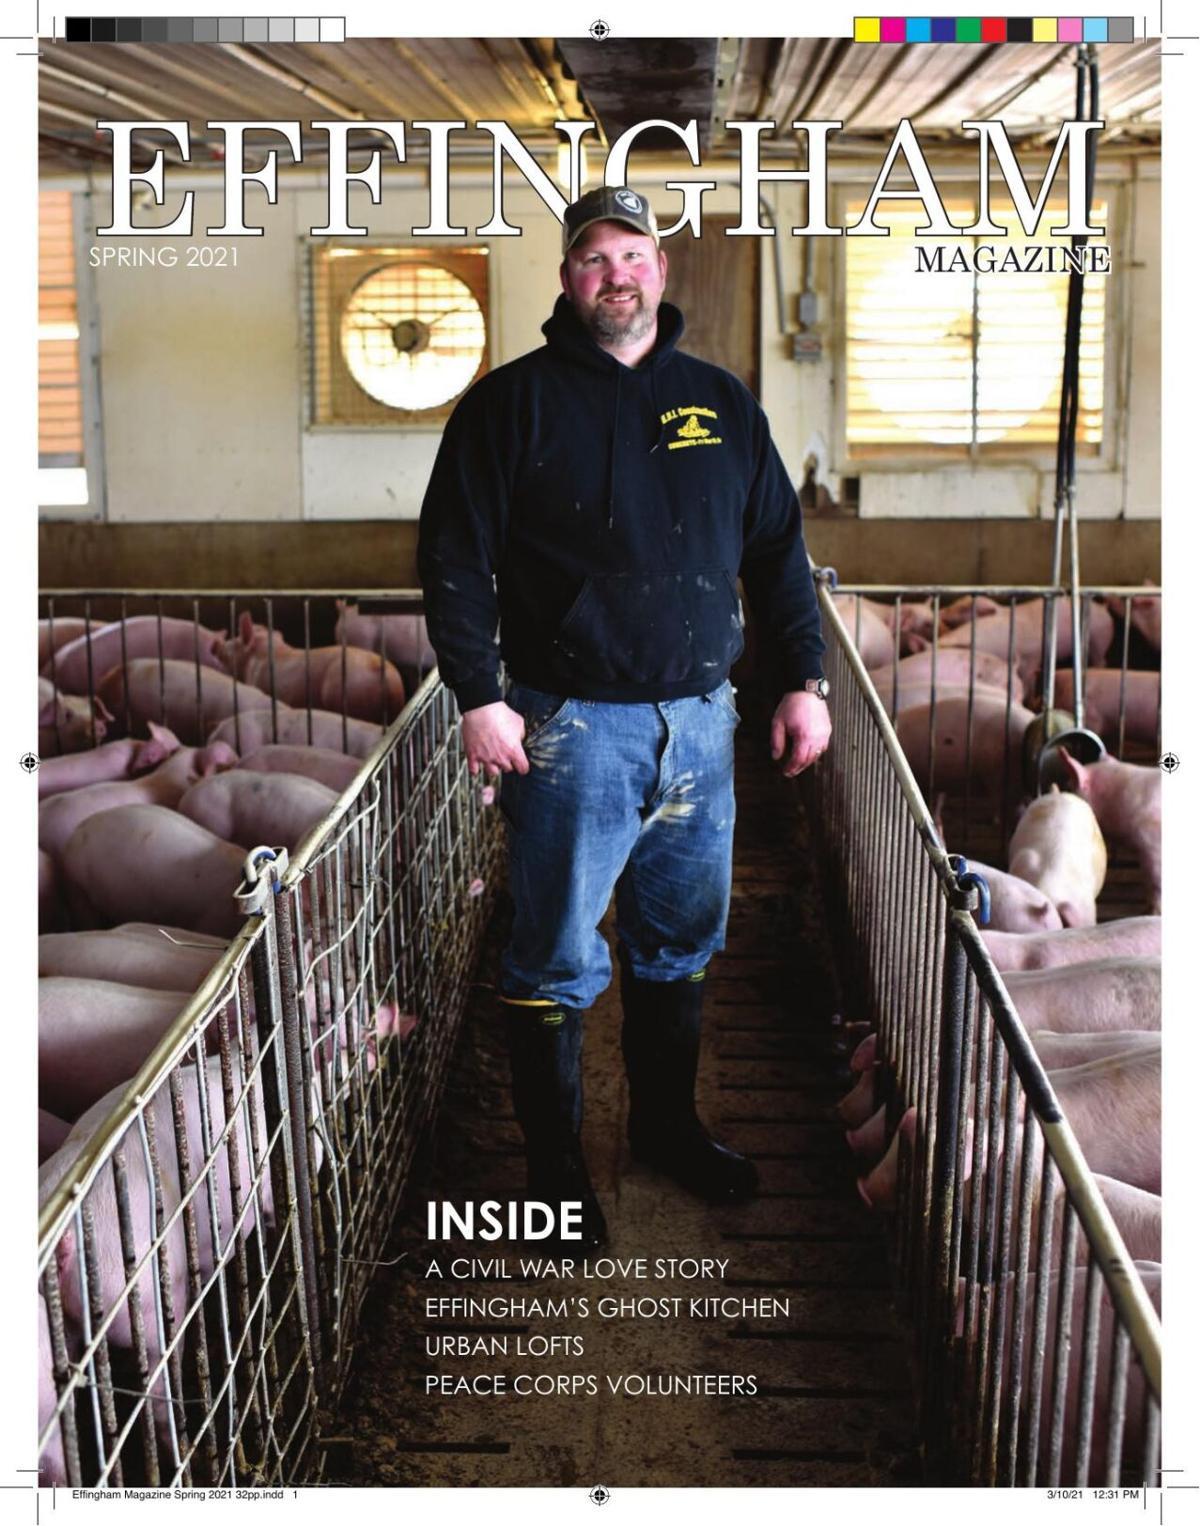 Effingham Magazine Spring 2021